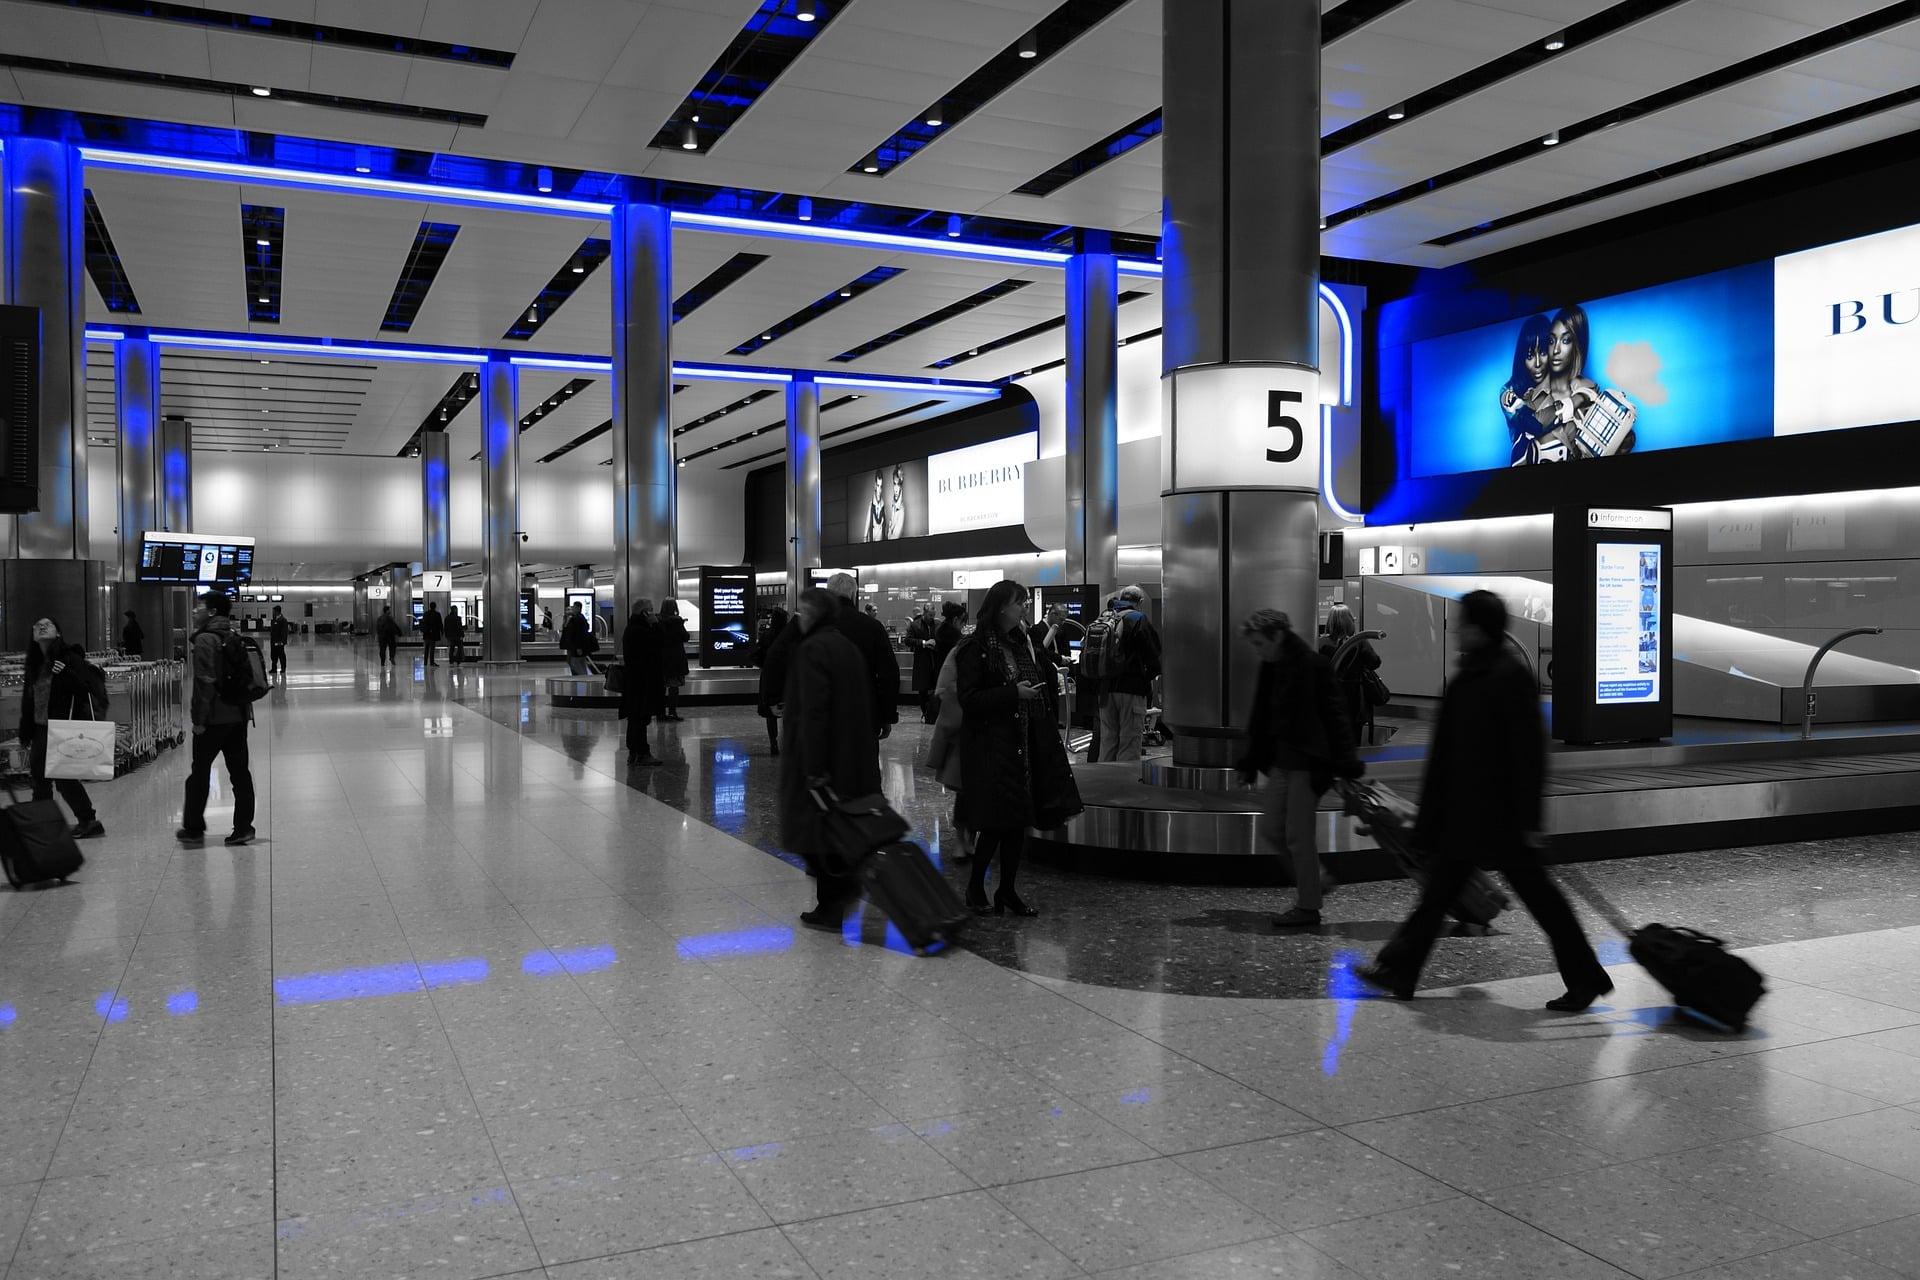 Bids Invited for £1.6bn Heathrow Railway